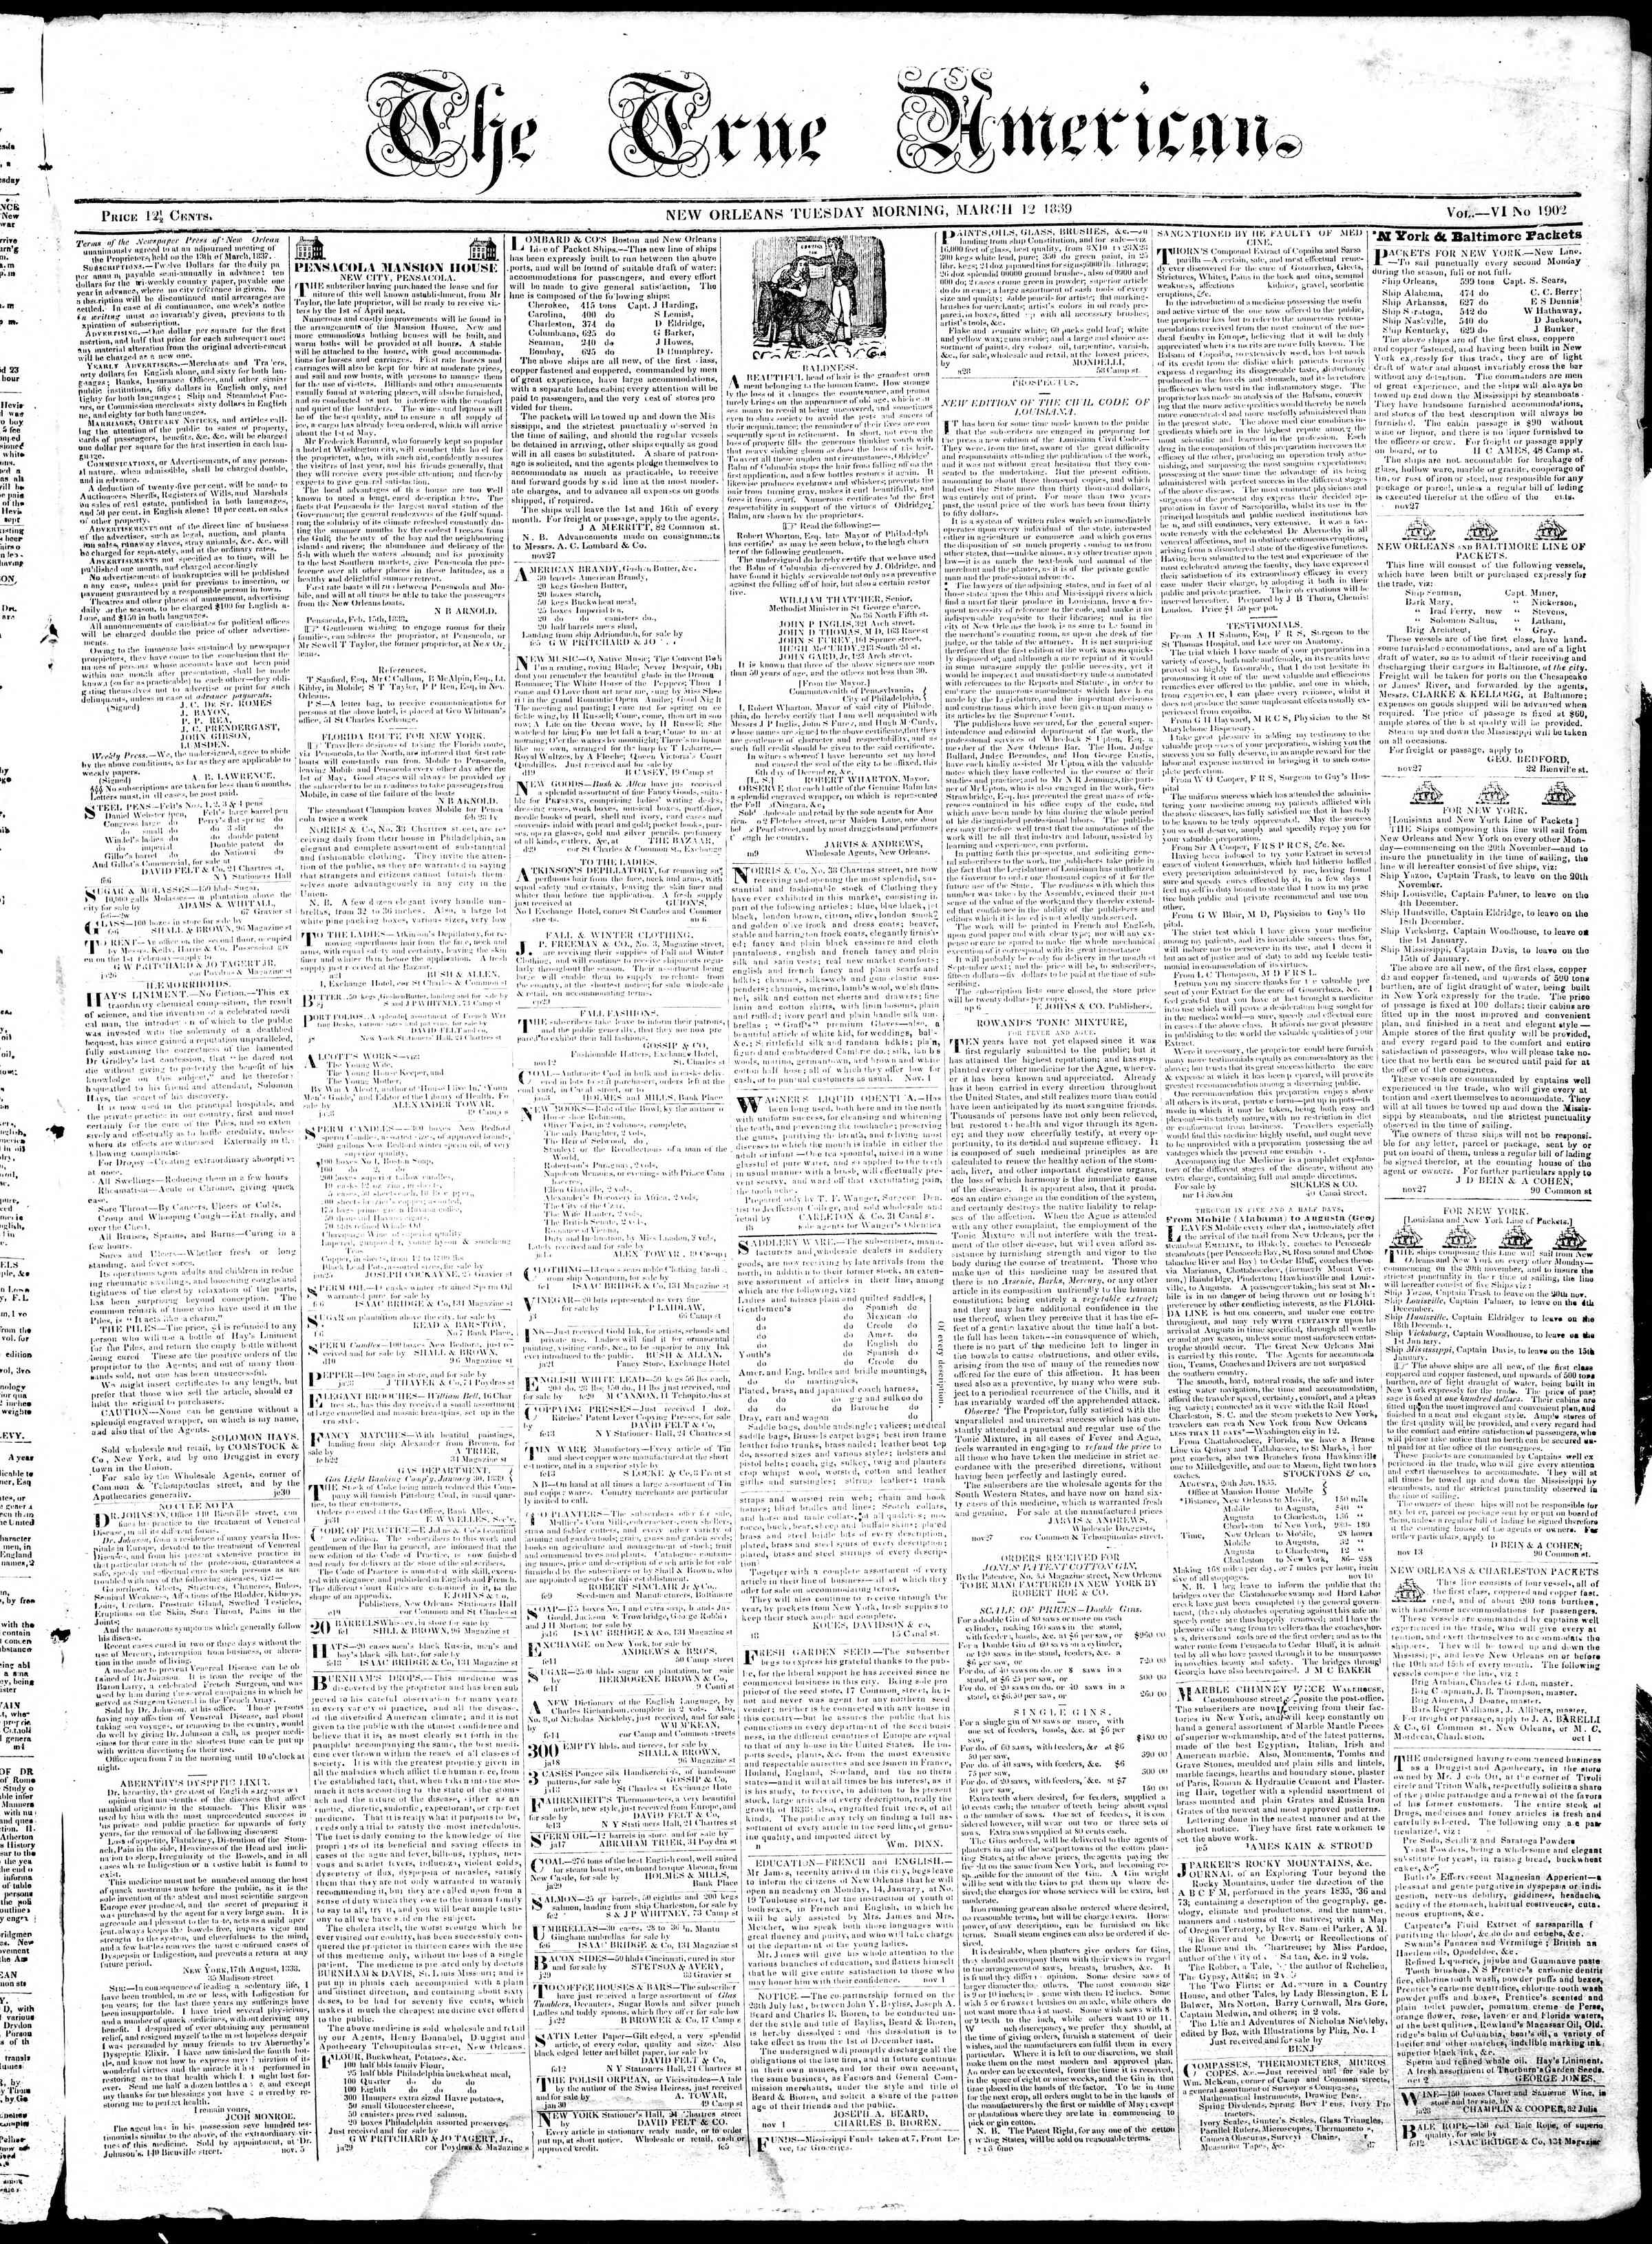 12 Mart 1839 Tarihli True American Gazetesi Sayfa 1